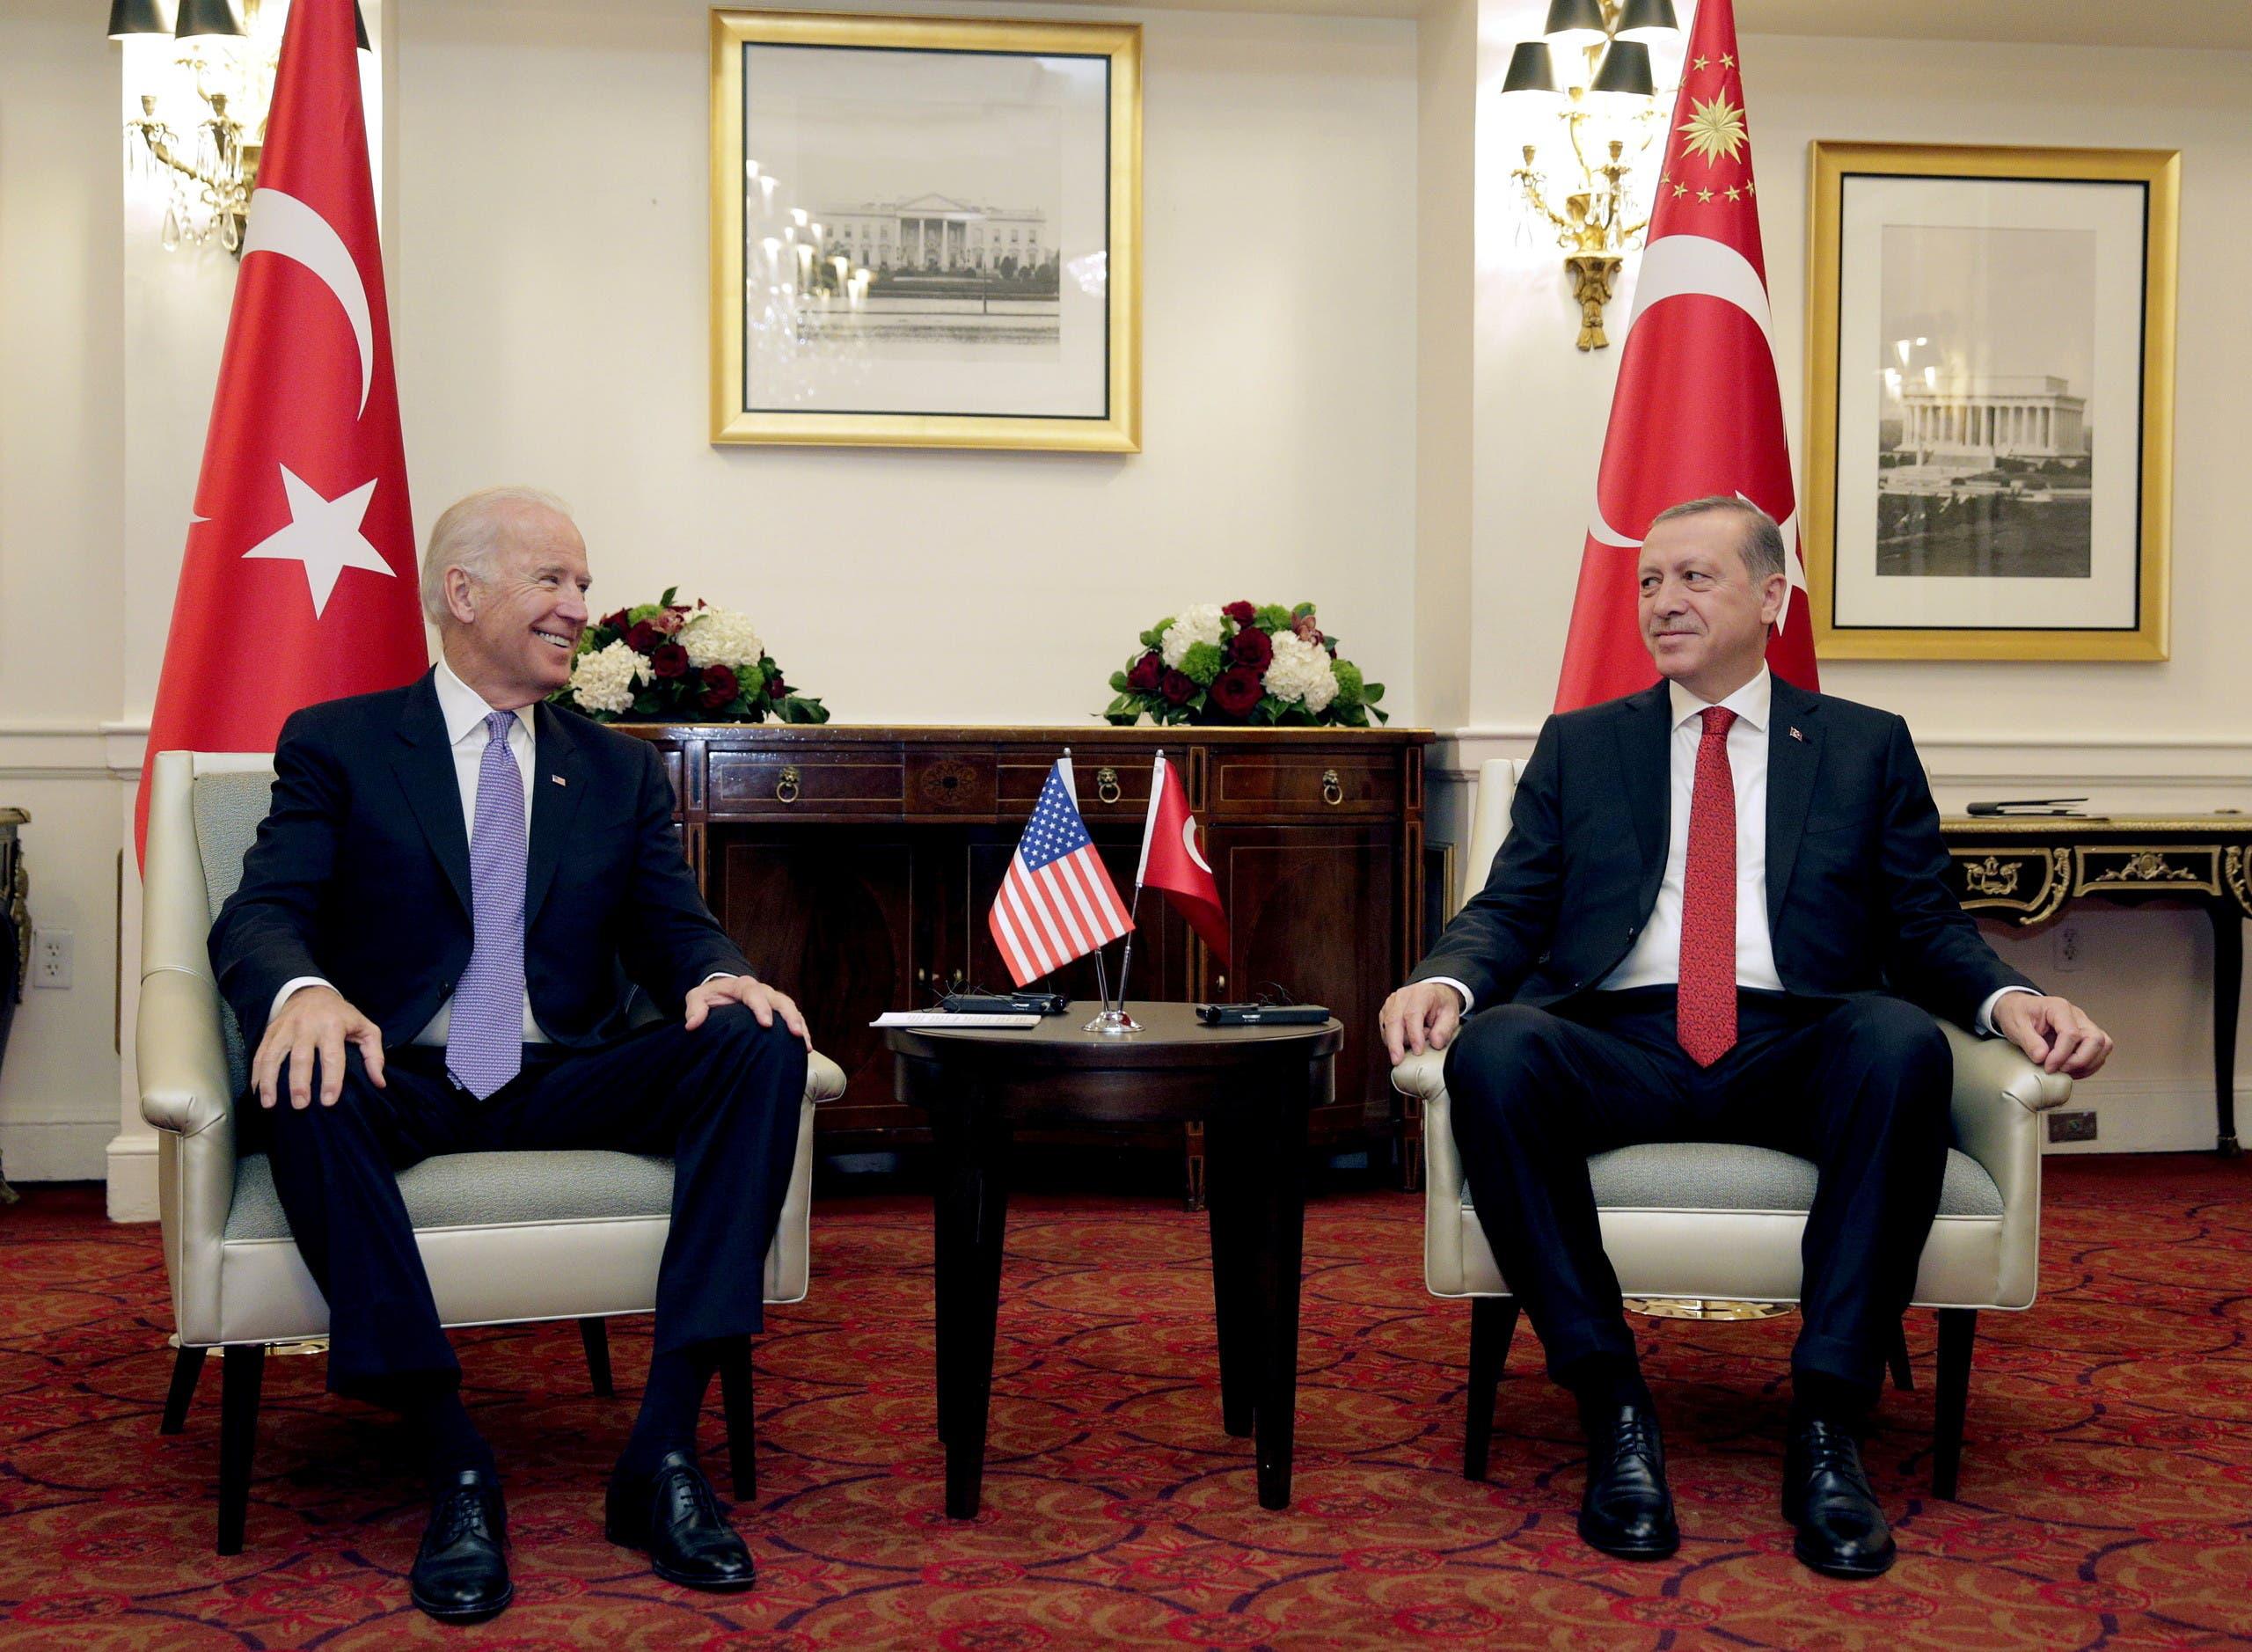 لقاء سابق بين بايدن وأردوغان في واشنطن في 2016